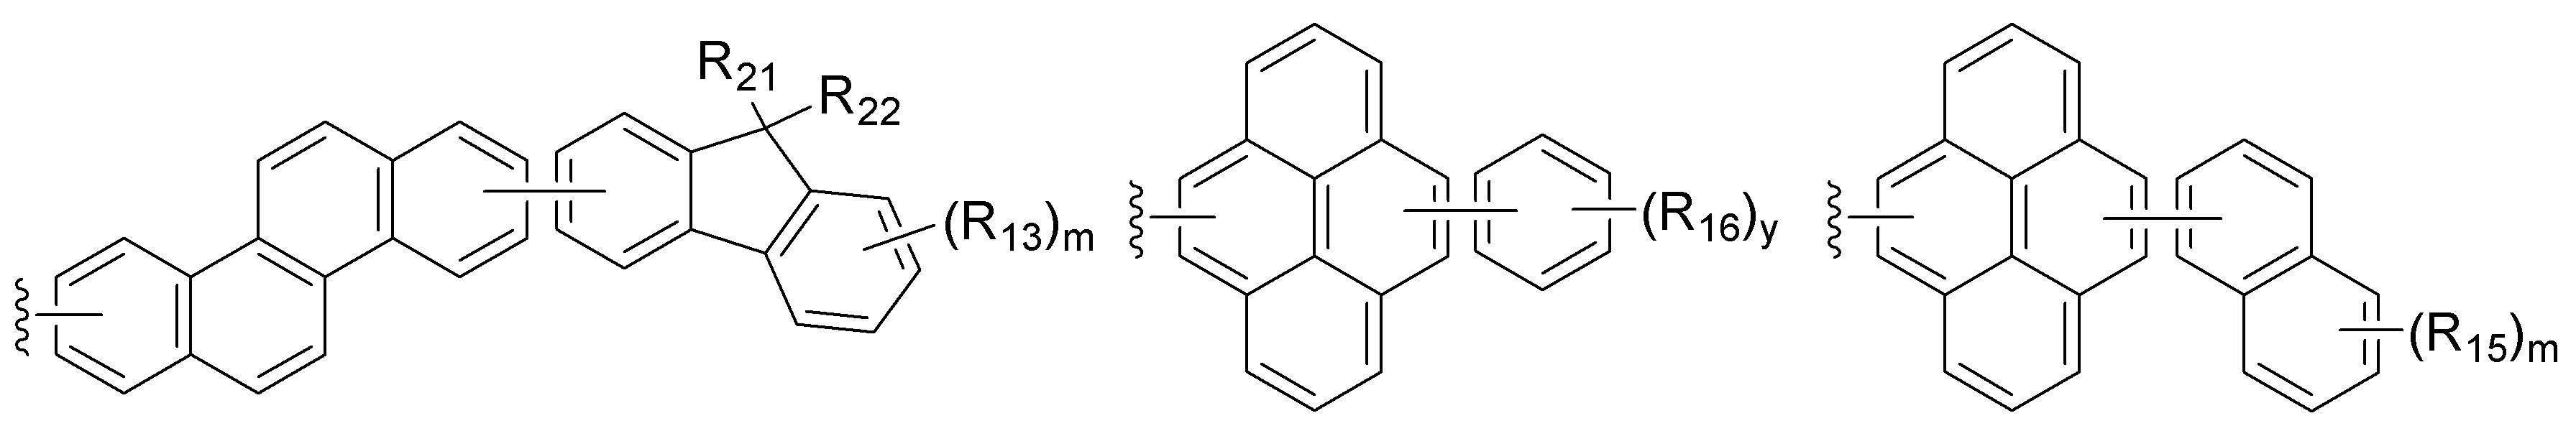 Figure 712009006163353-pat00682